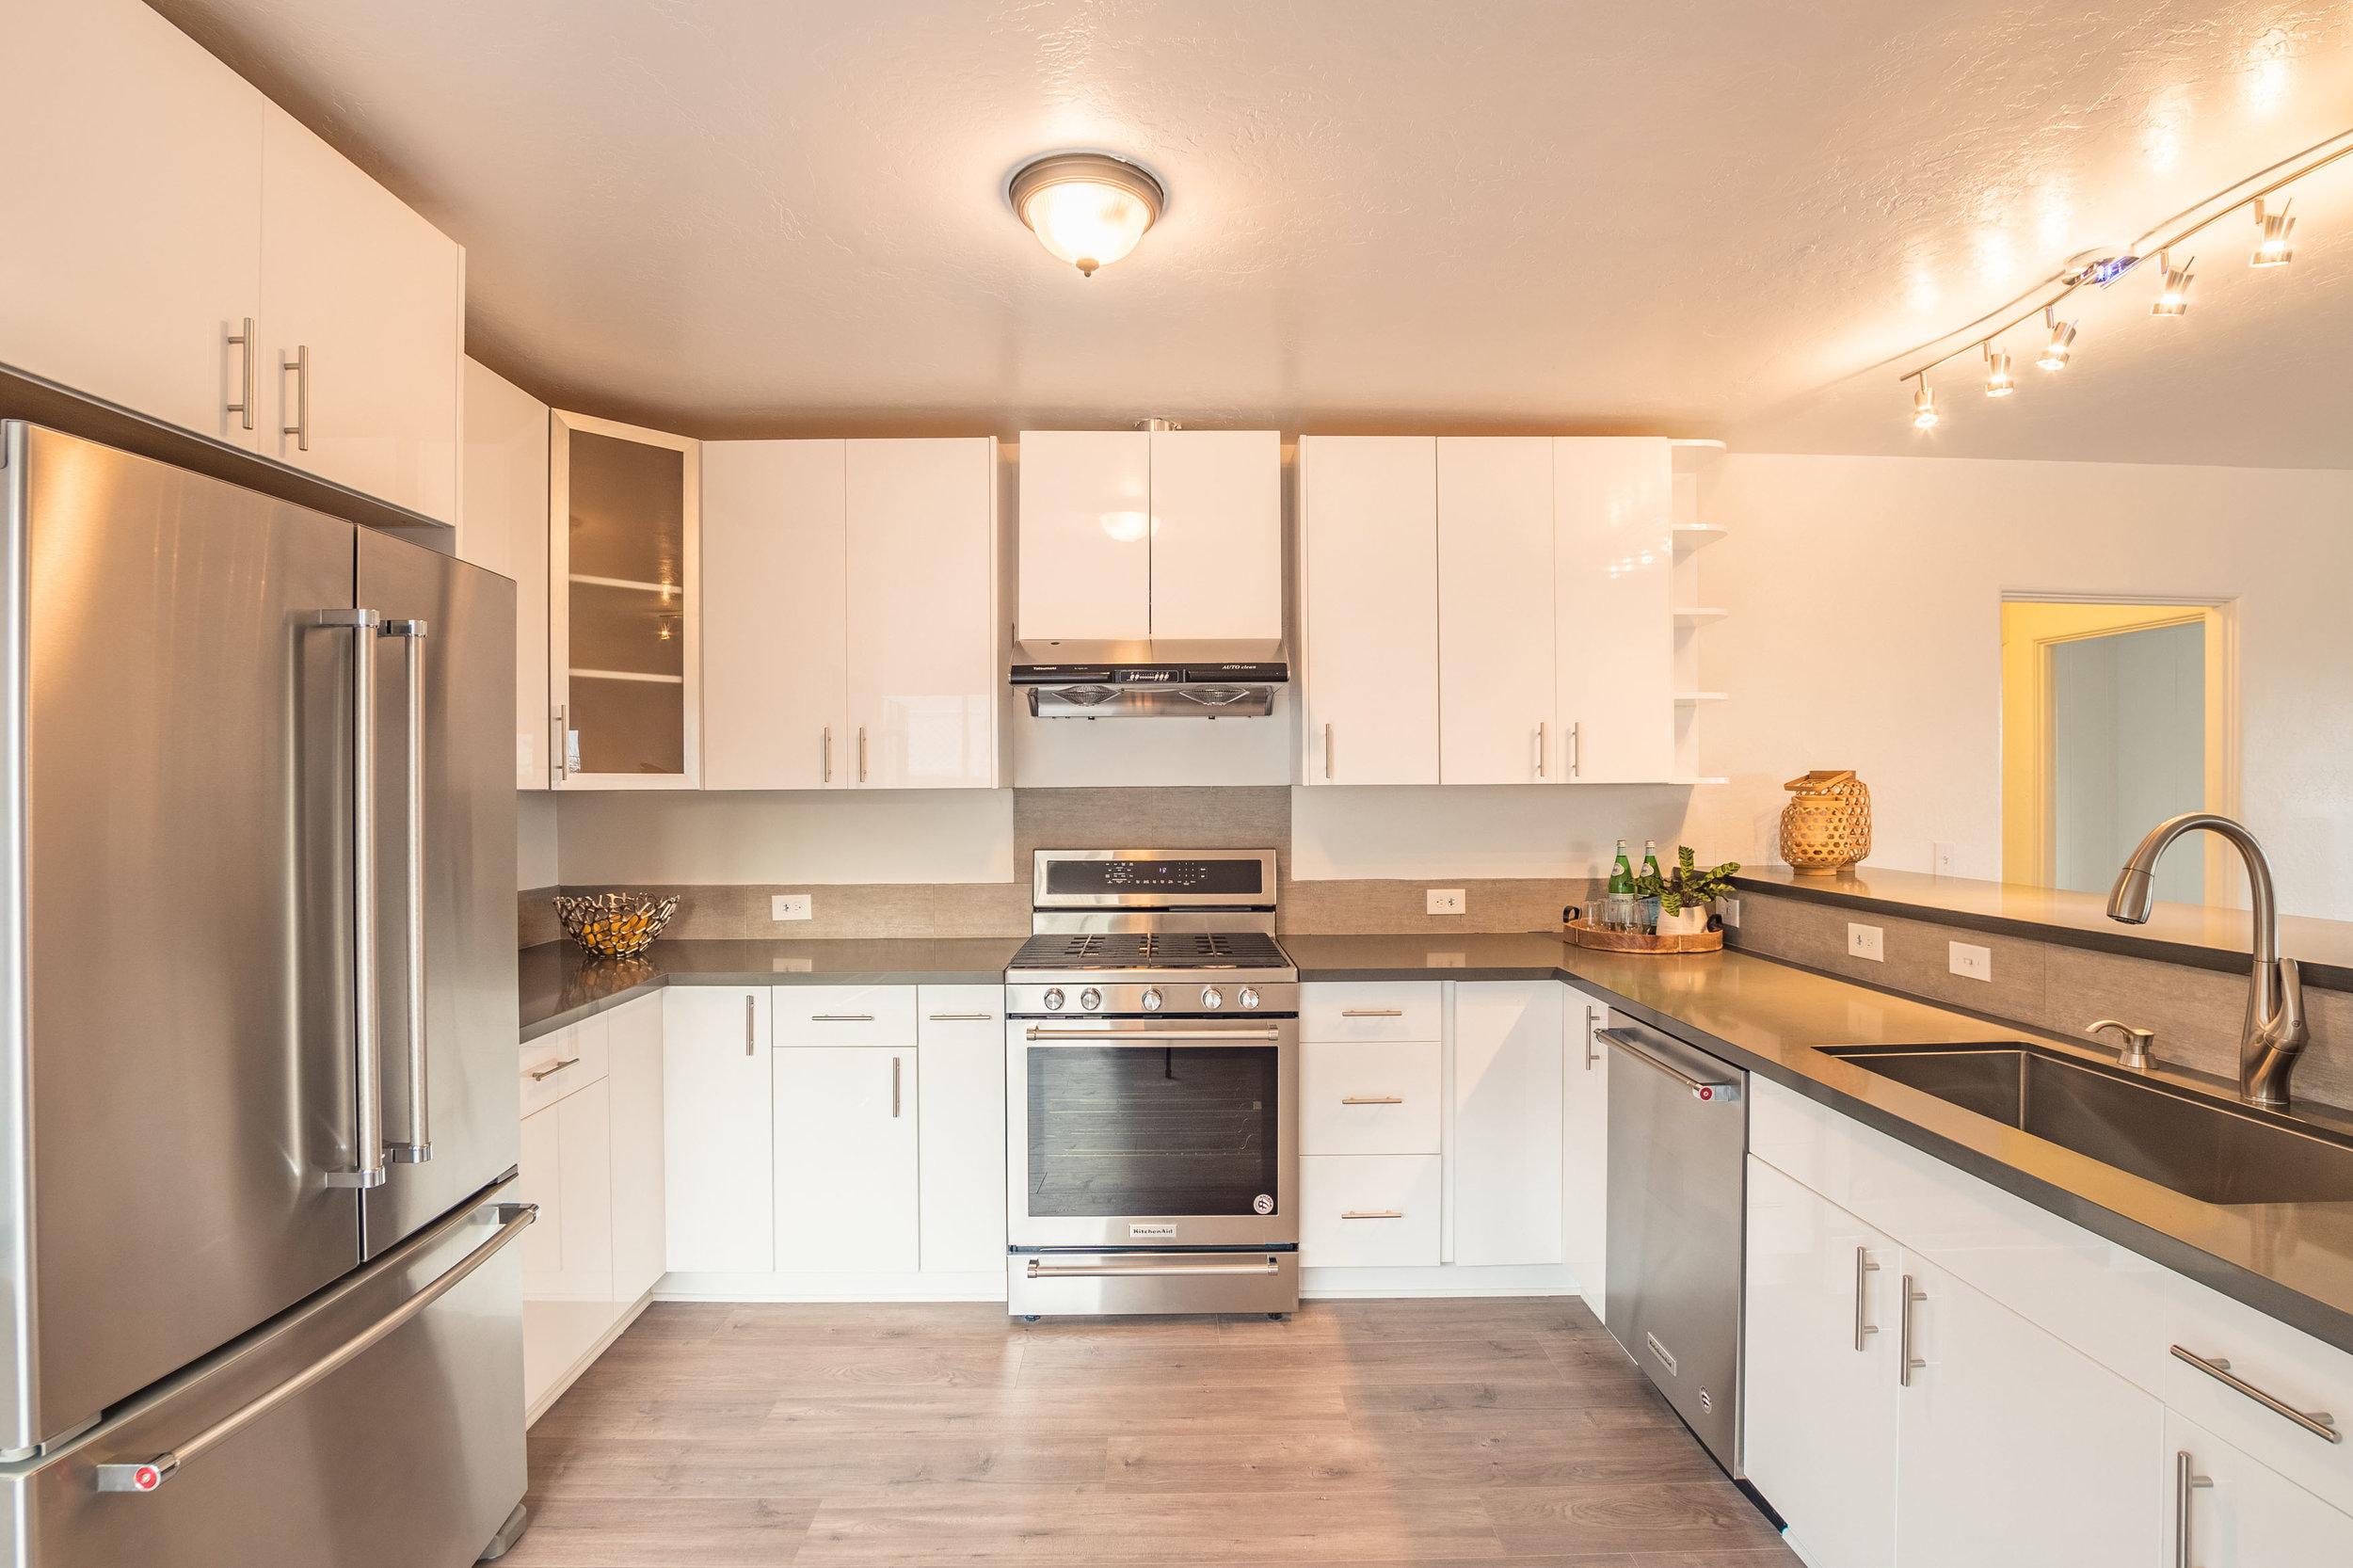 Updated Kitchen with Stainless Steel Appliances Santa Cruz Homes